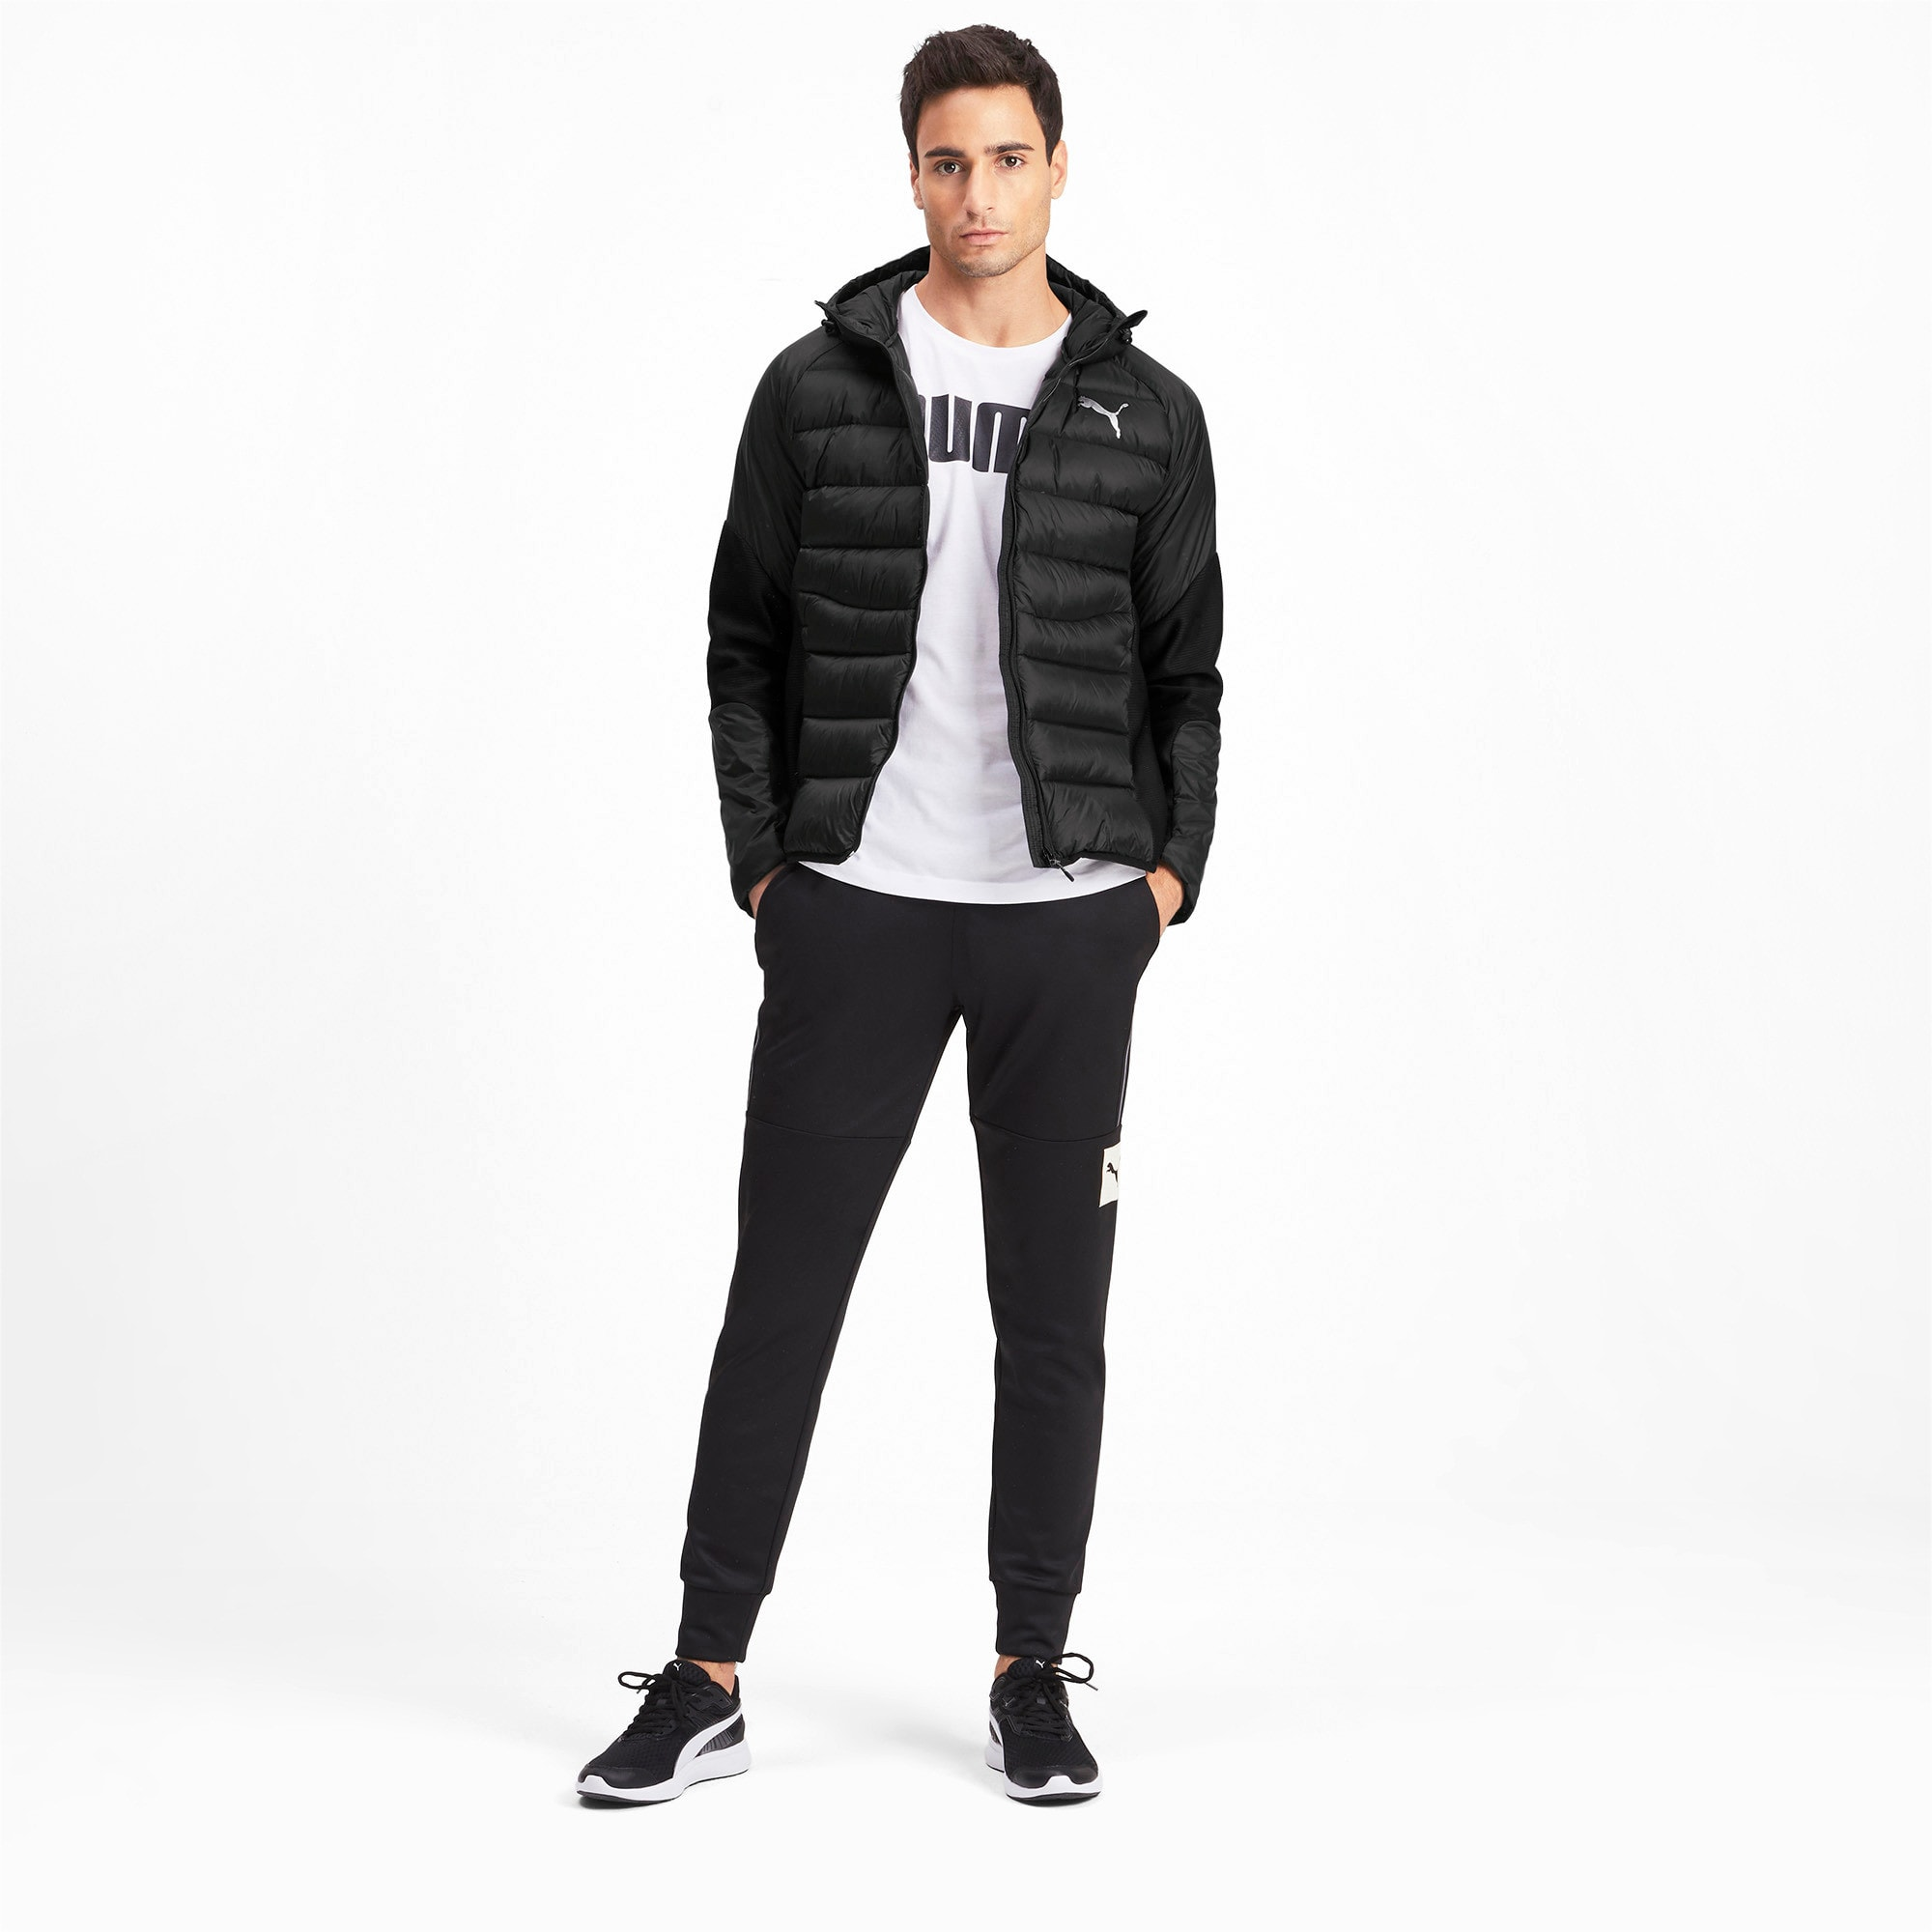 Thumbnail 3 of 600 Hybrid Down Men's Jacket, Puma Black, medium